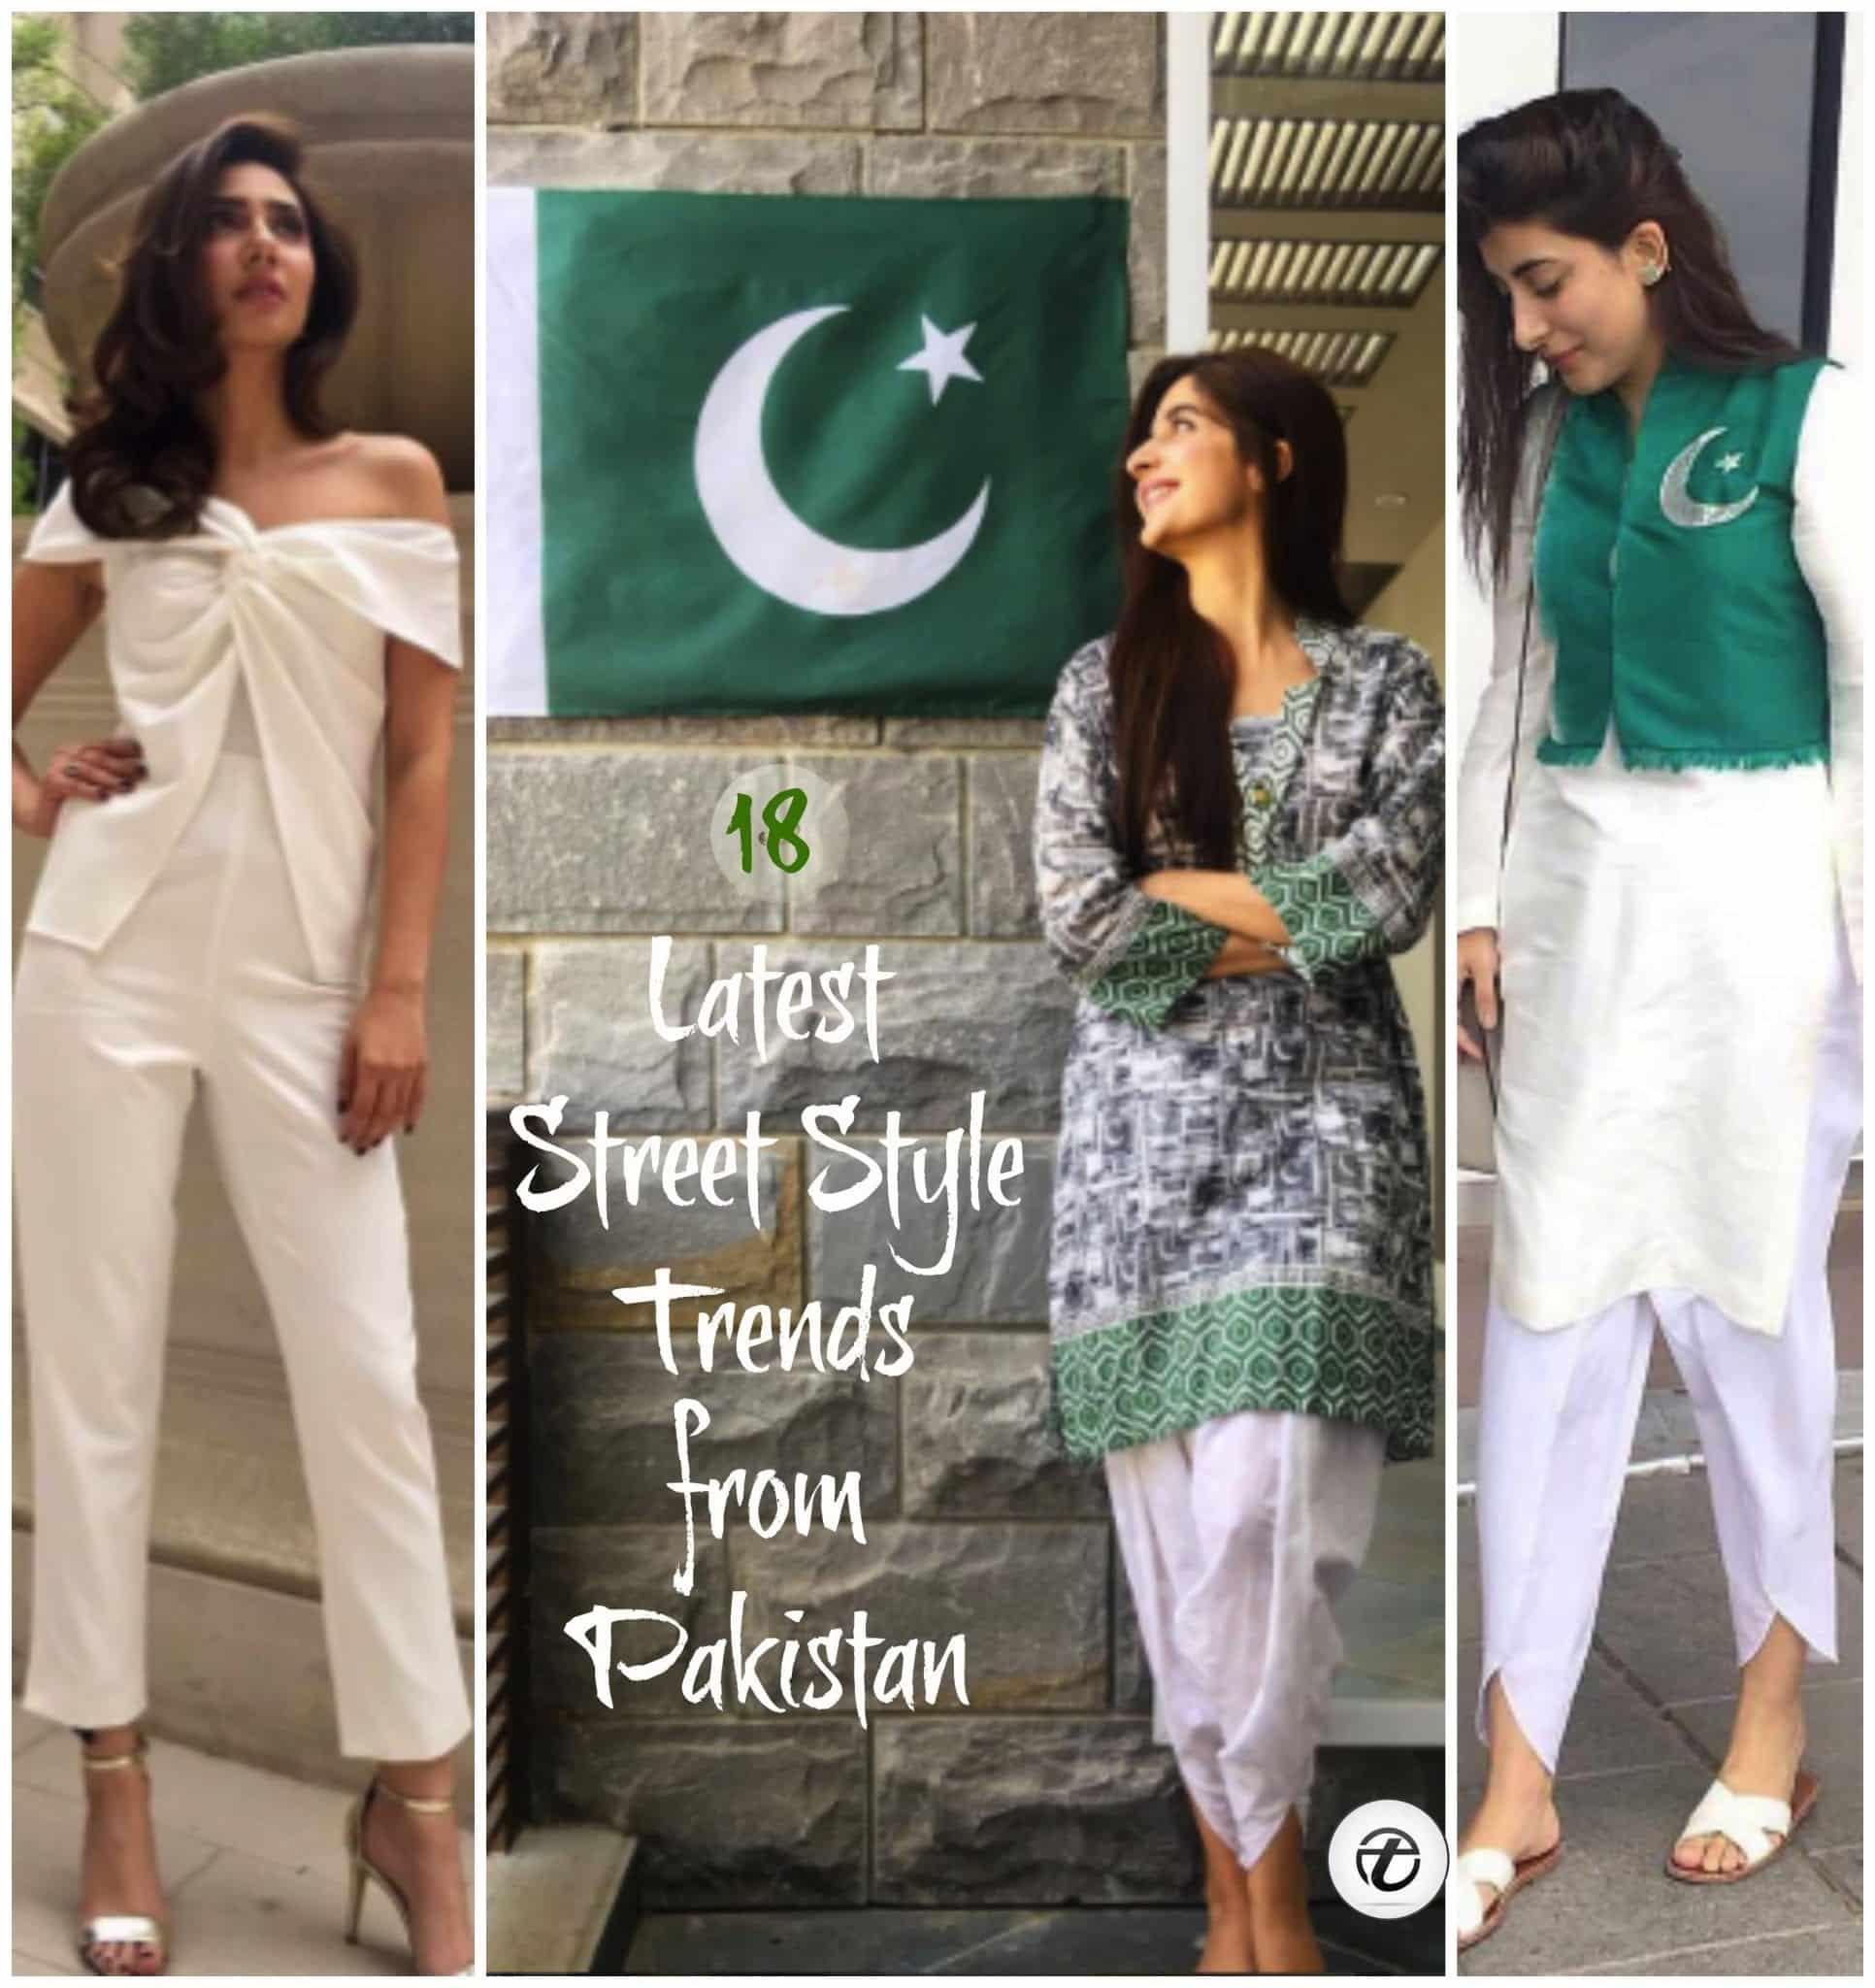 d5b468980a77 18 Chic Pakistan Street Style Fashion Ideas to Follow